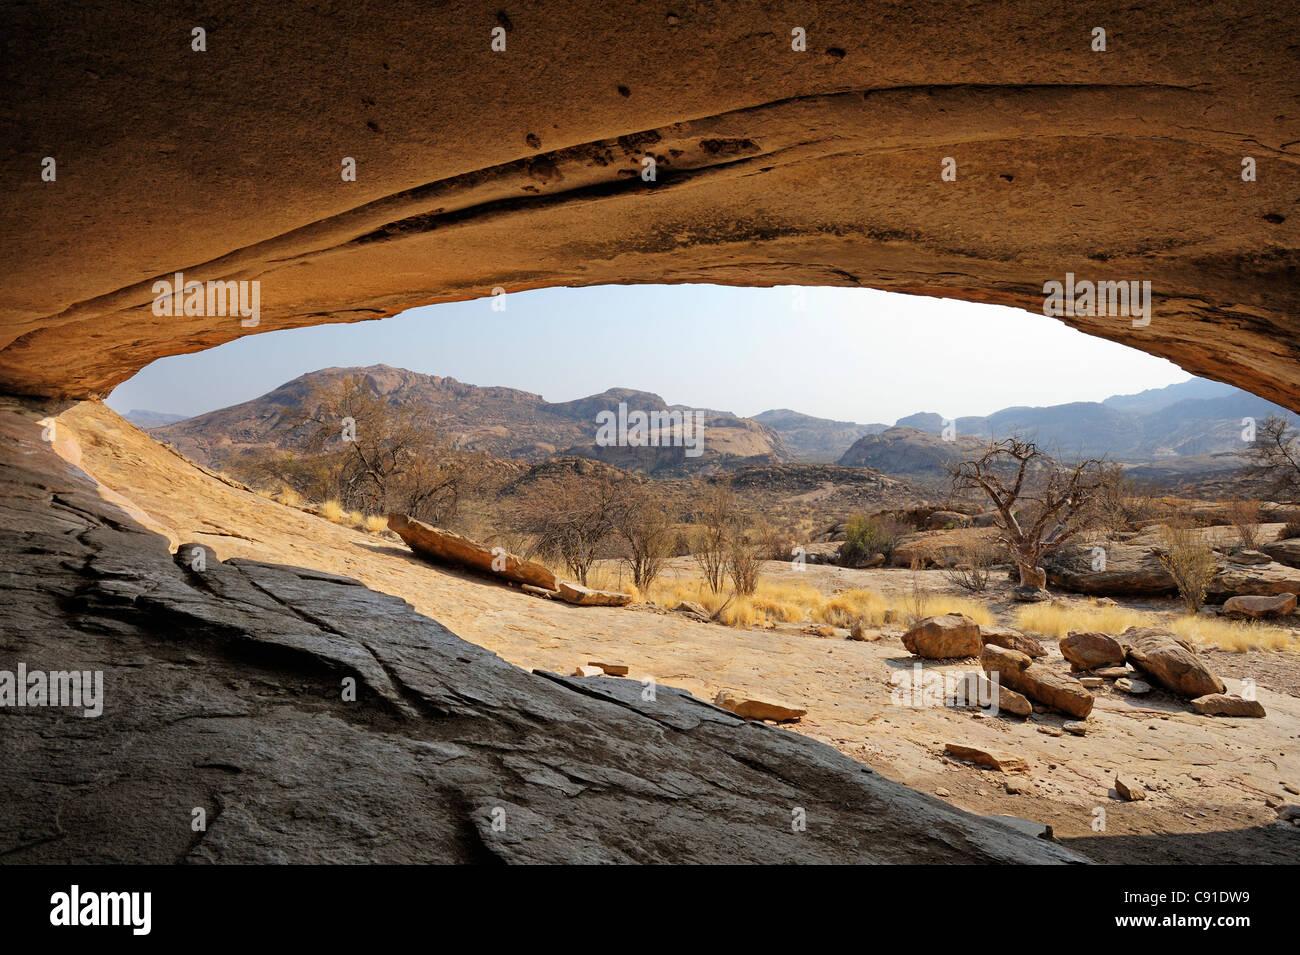 Rock shelter Phillipp's Cave con vista su savannah, Ameib, Erongo mountains, Namibia Immagini Stock